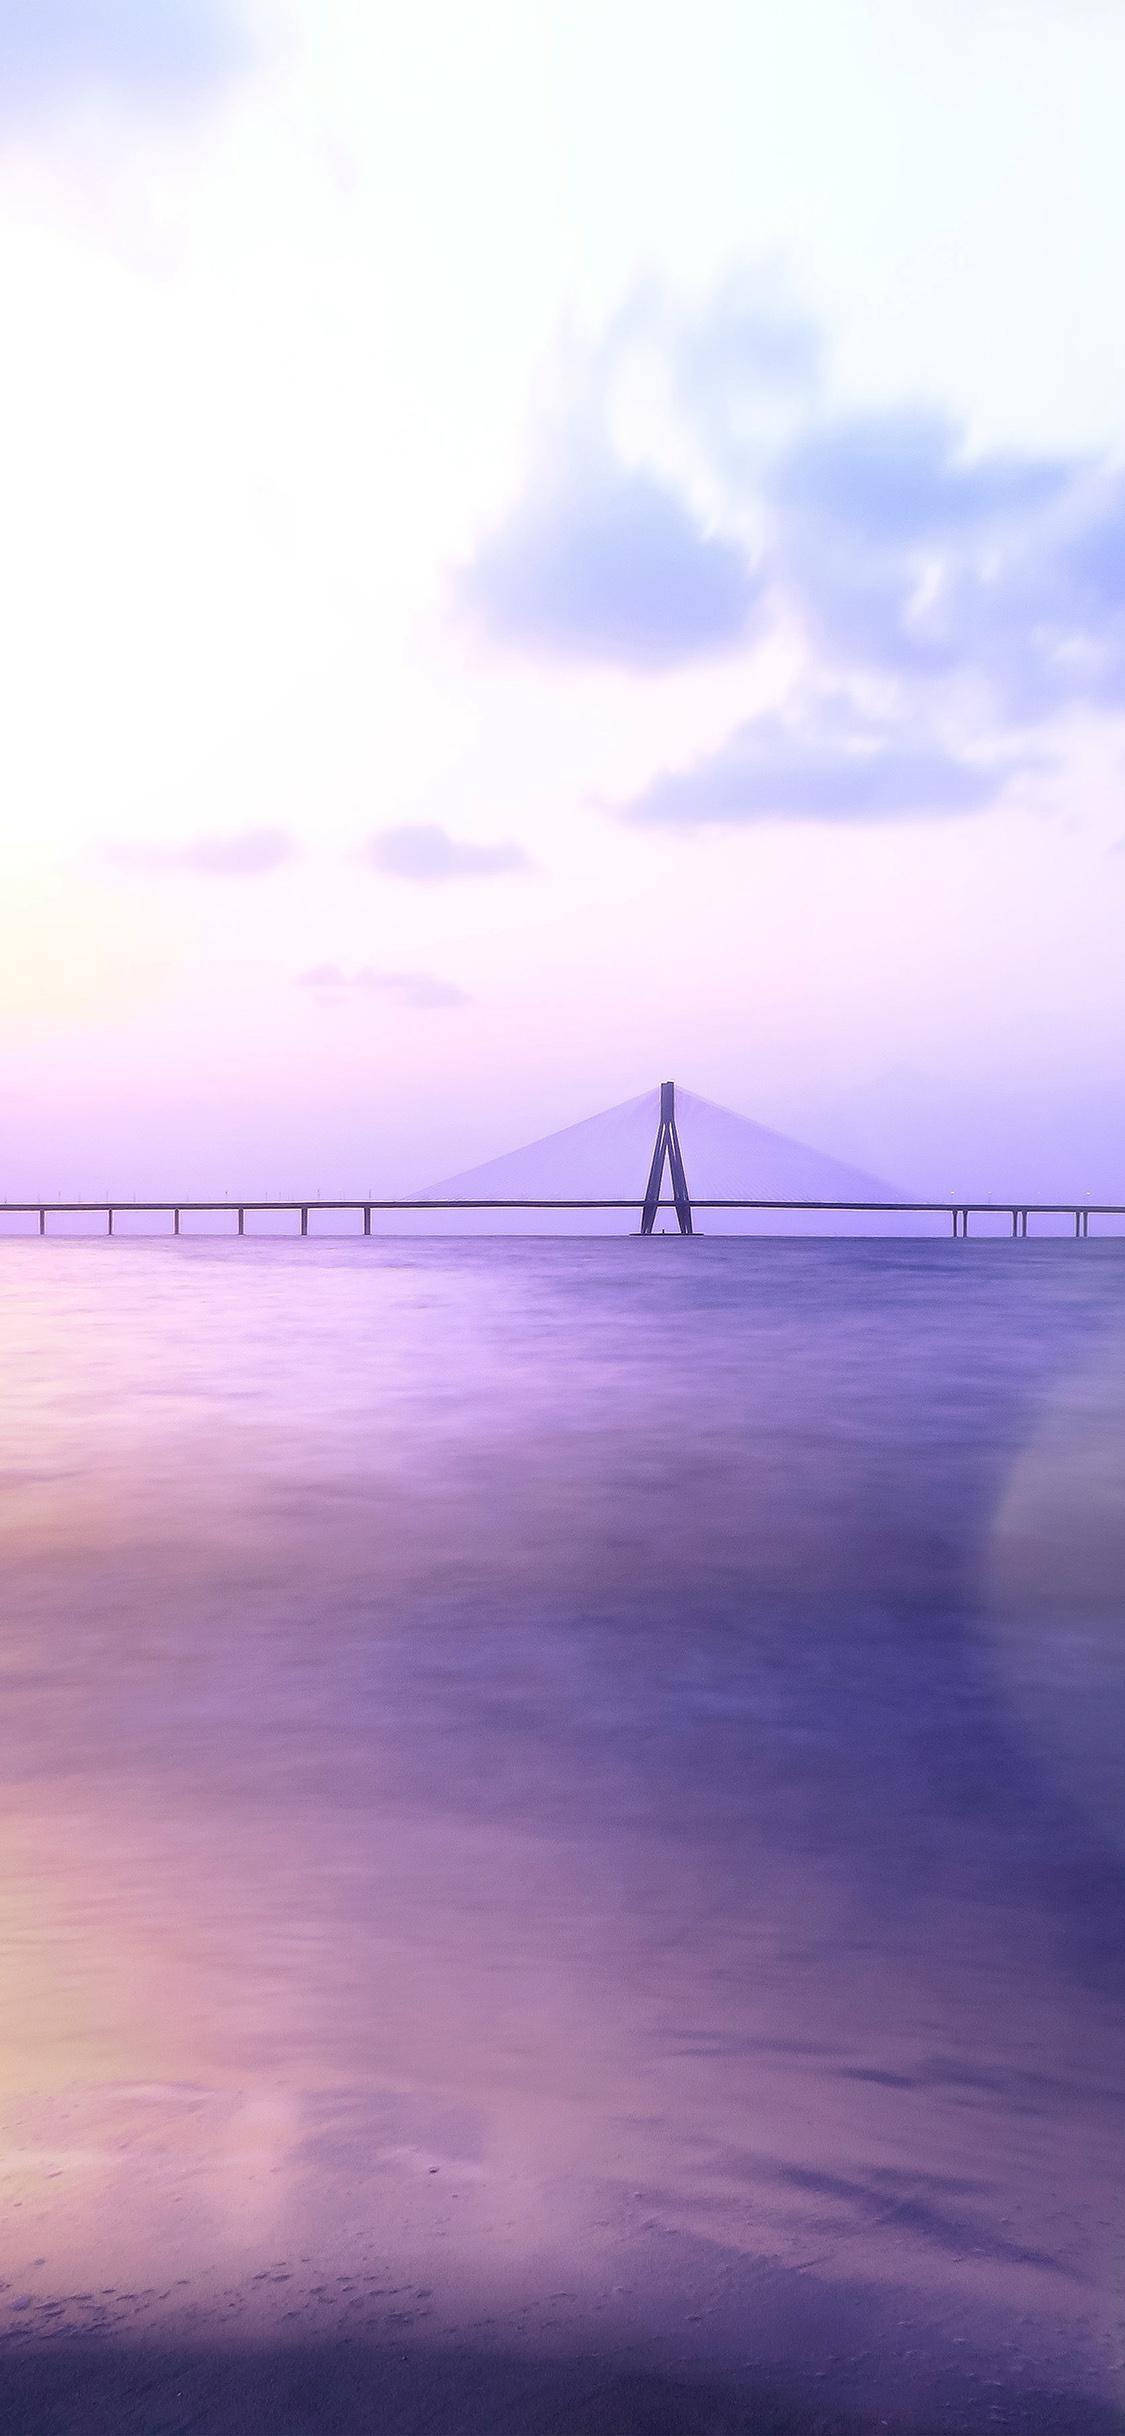 iPhonexpapers.com-Apple-iPhone-wallpaper-mz41-city-bridge-purple-river-nature-flare